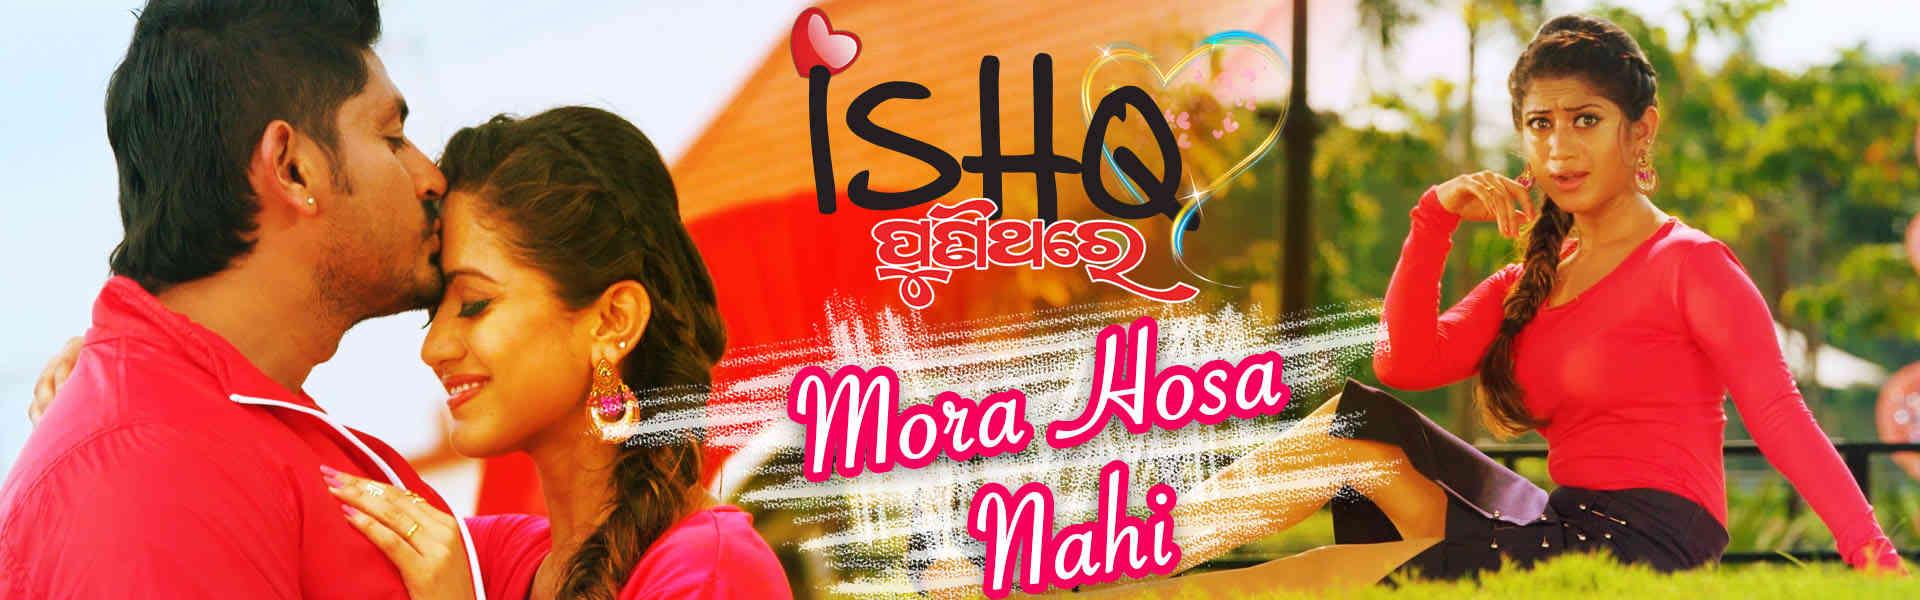 Mora Hosa Nahi